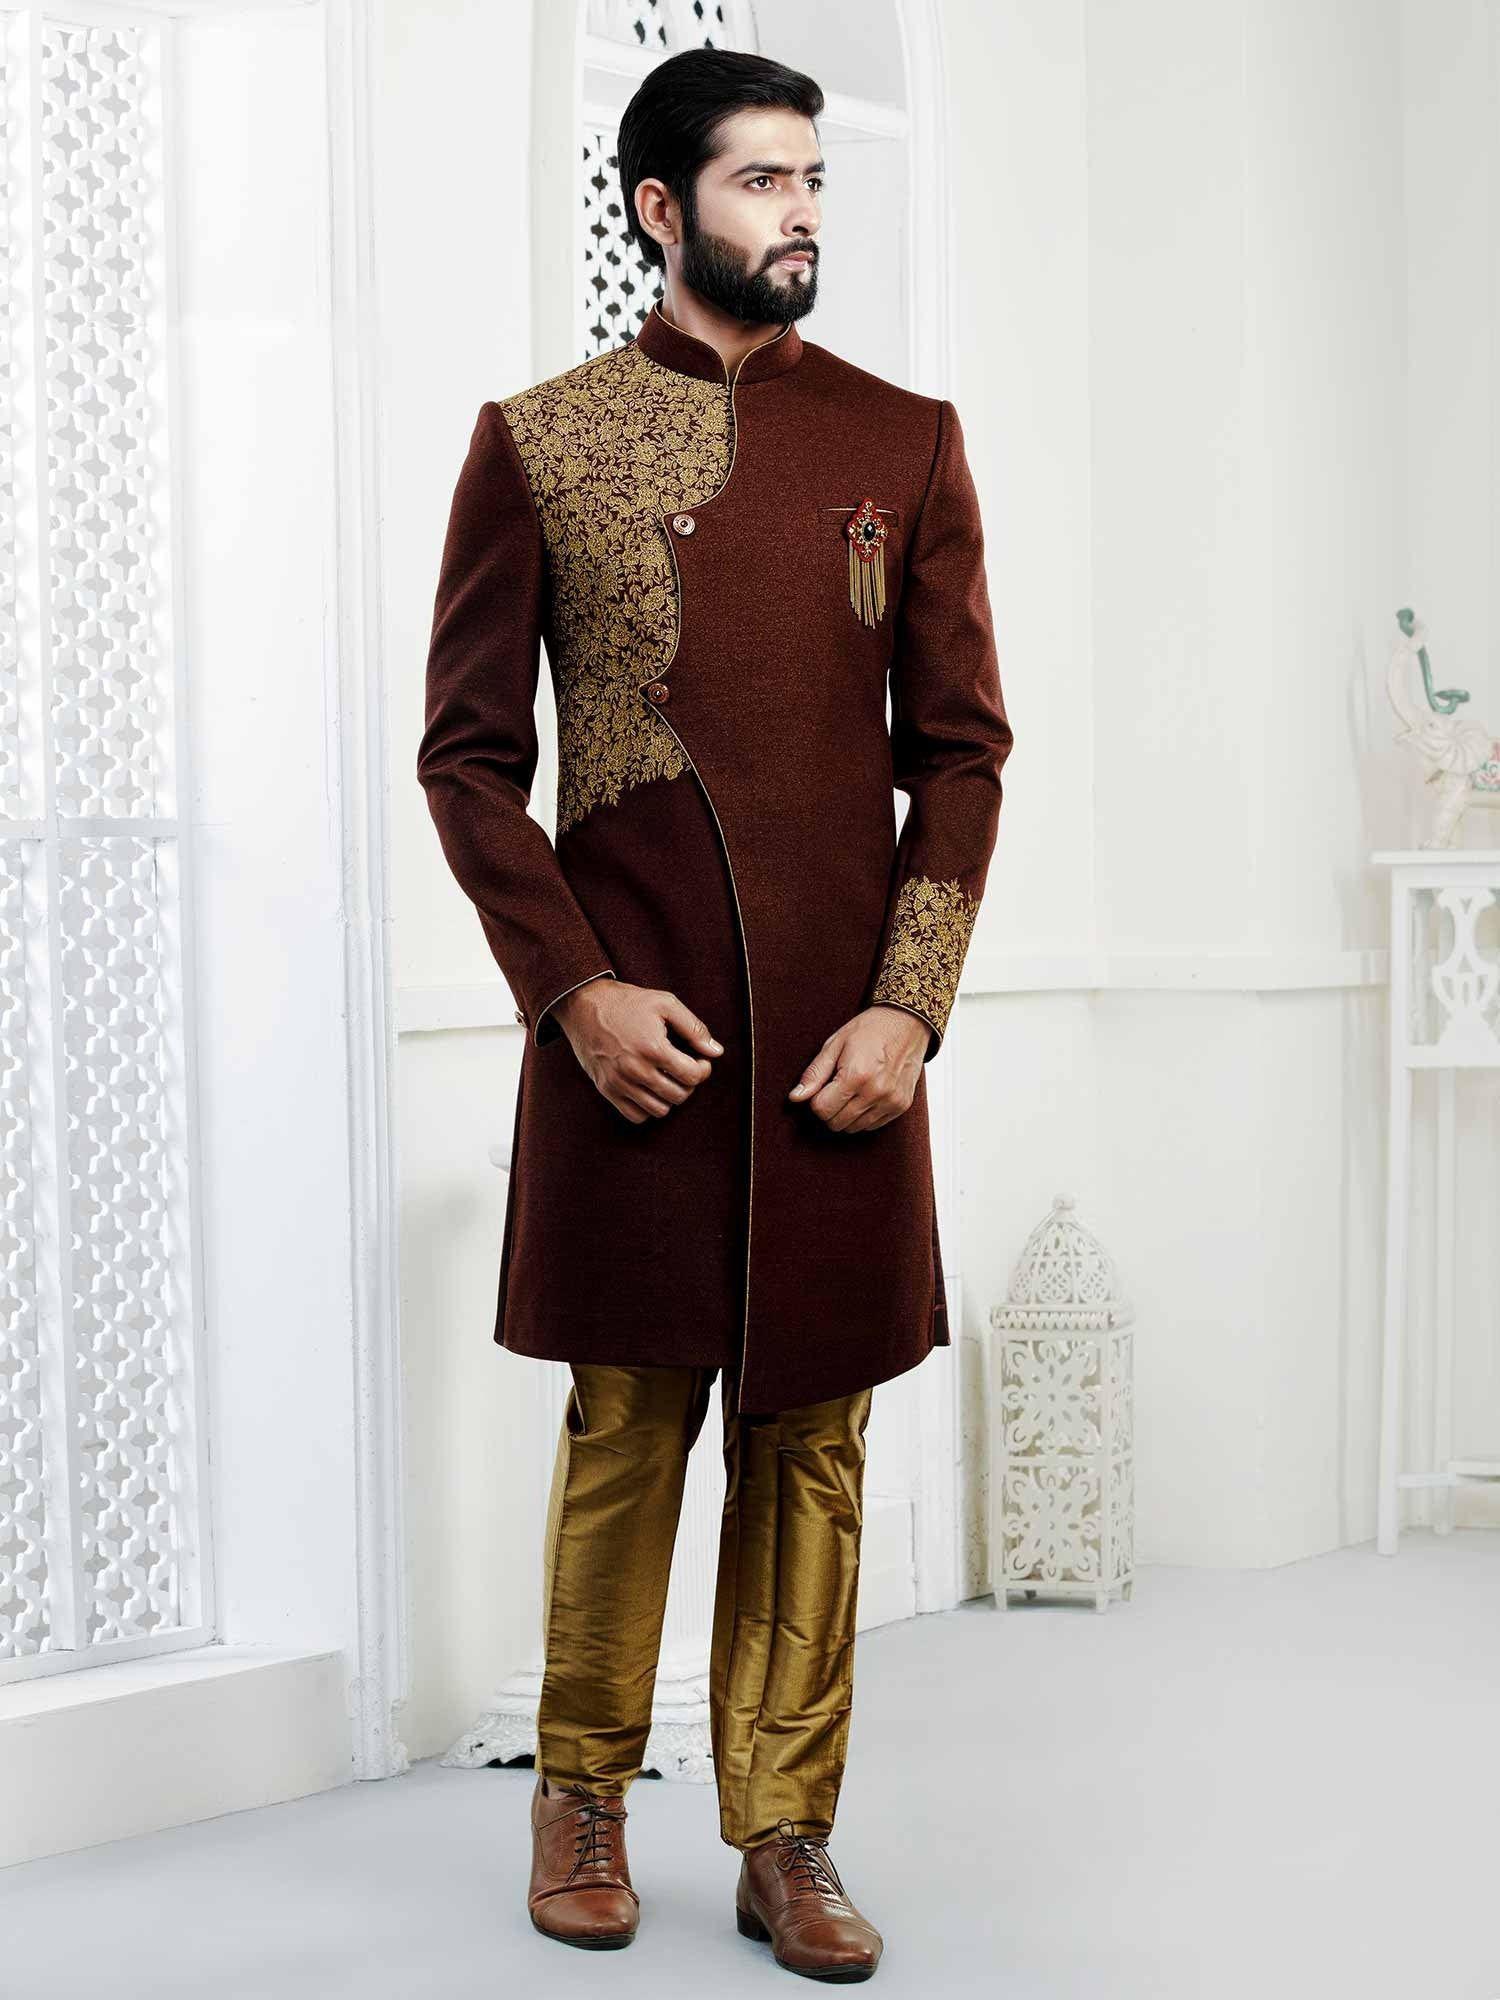 Designer Indowestern For Wedding Wedding Indowestern Sherwani For Men In Brownish Maroon Colour Western Suits Sherwani Menswear